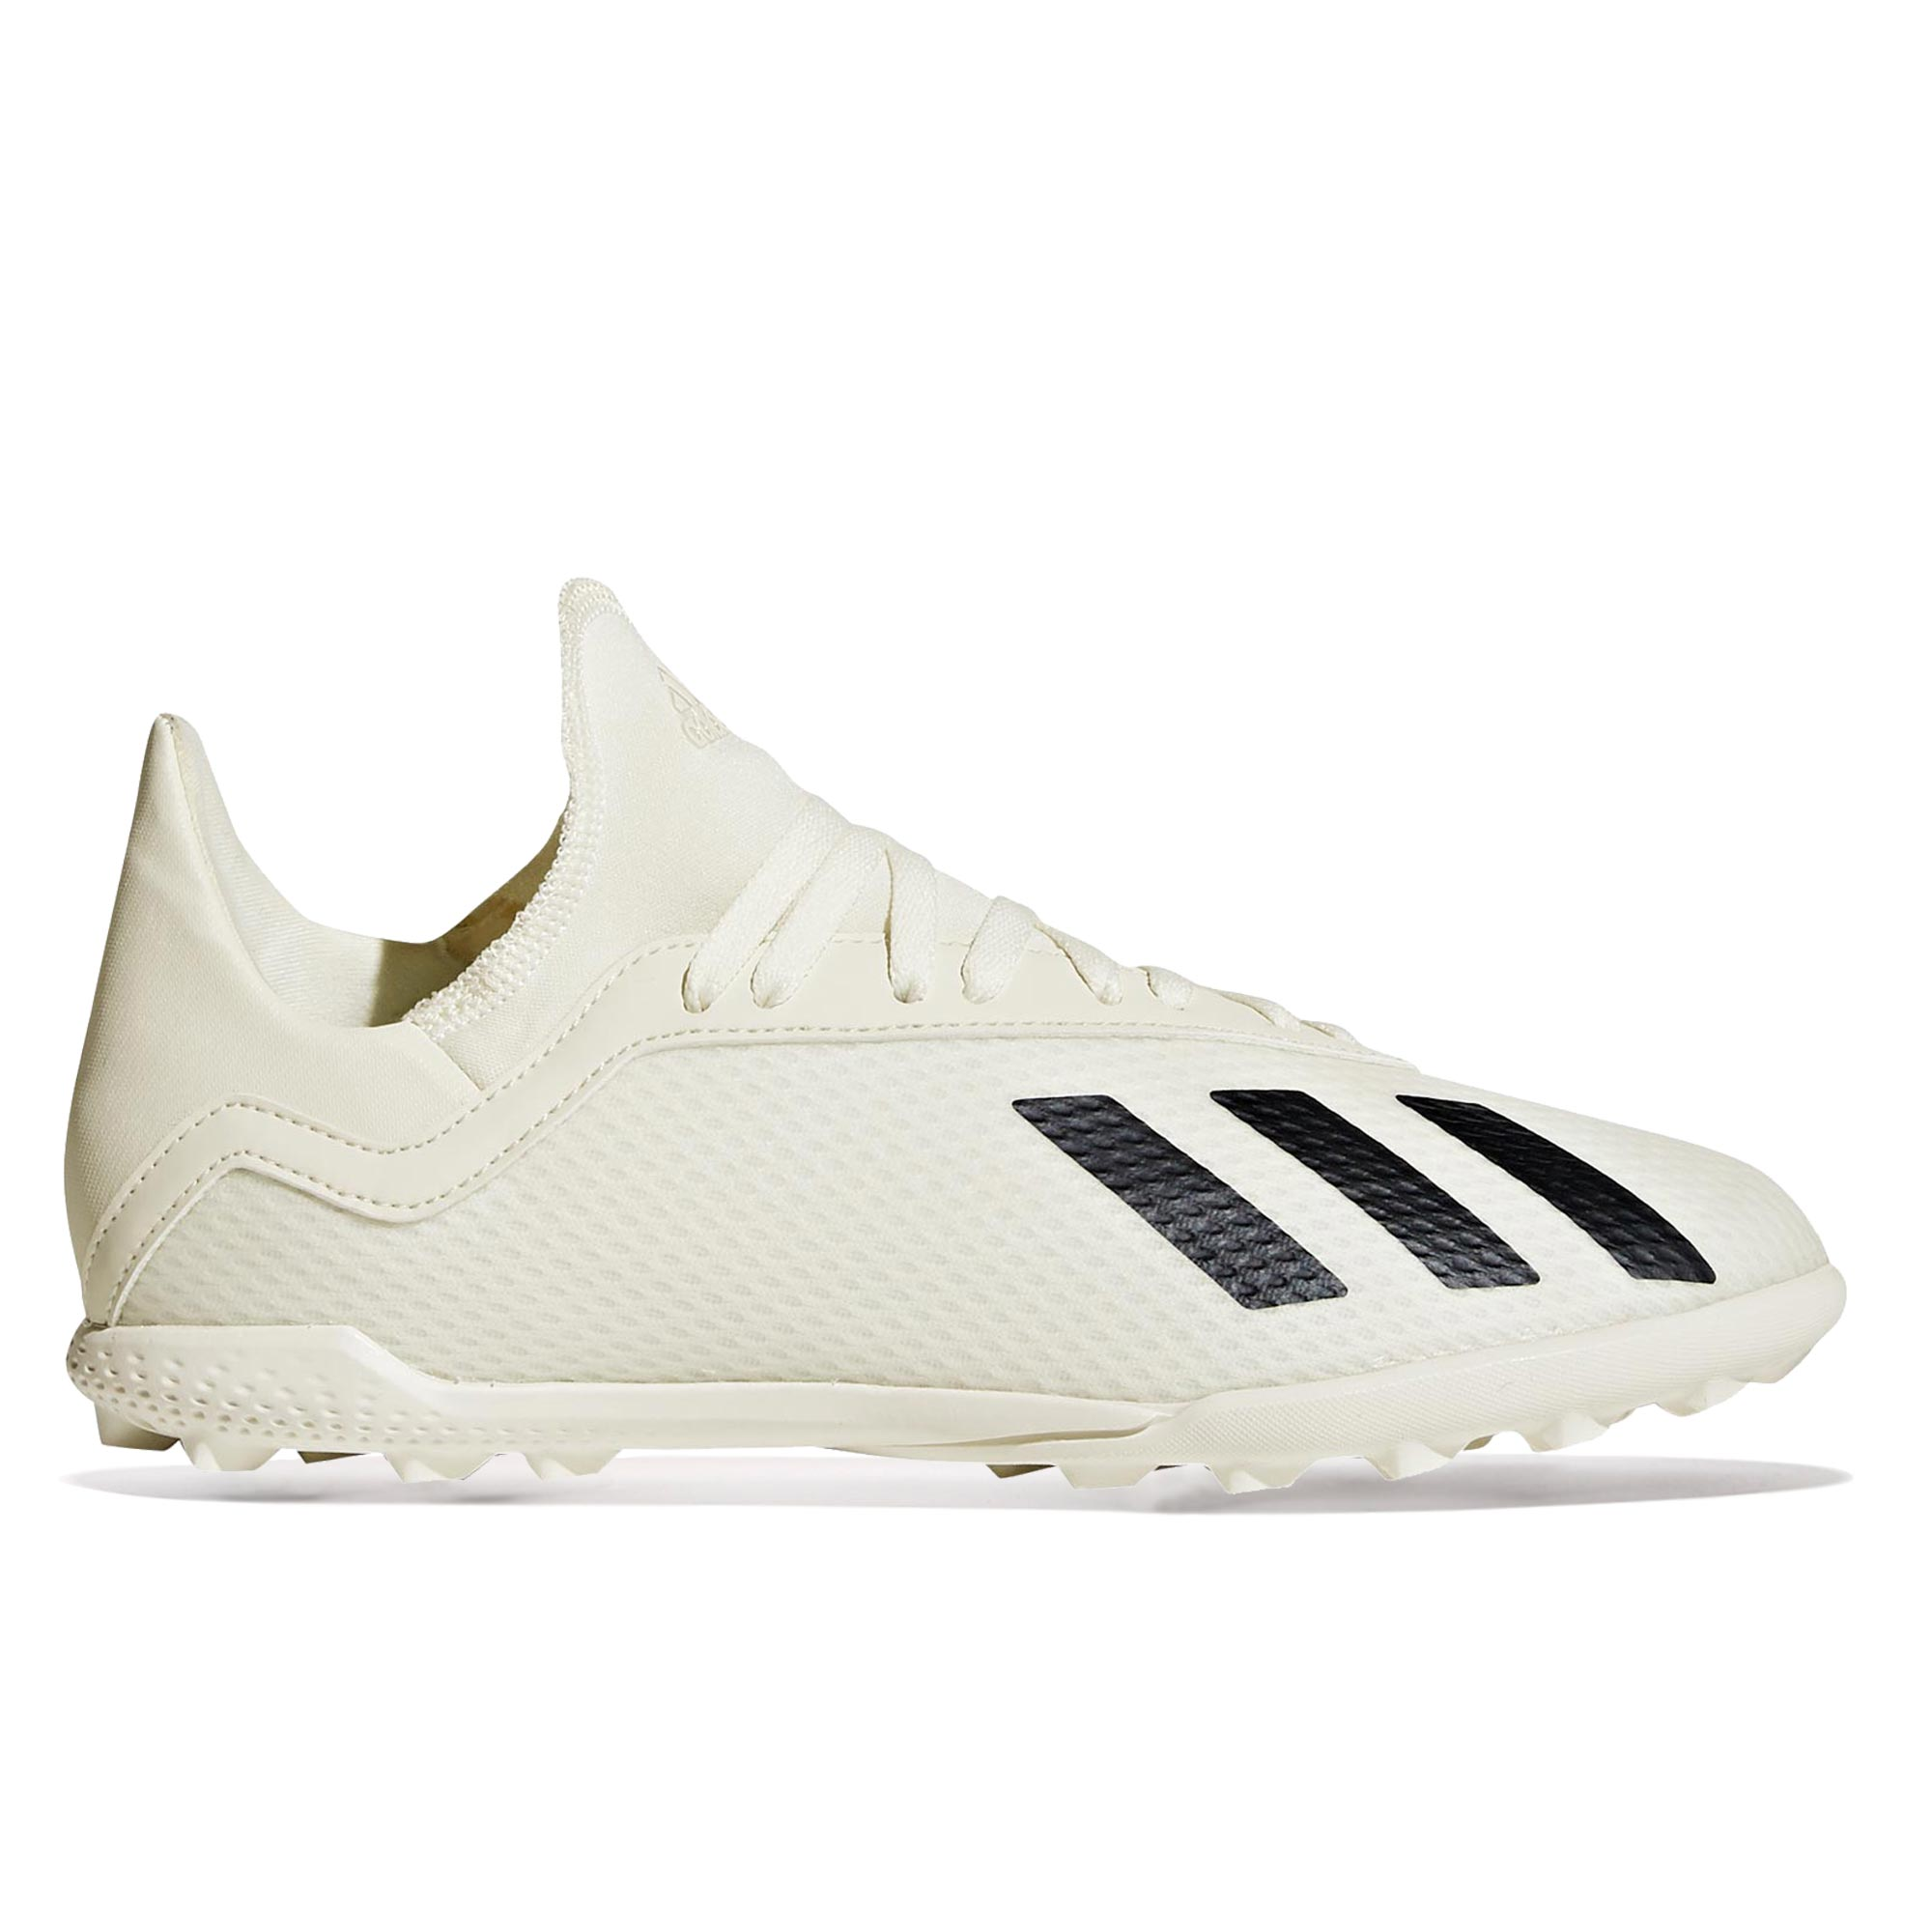 Adidas X Tango 18.3 Astroturf Trainers - White - Kids